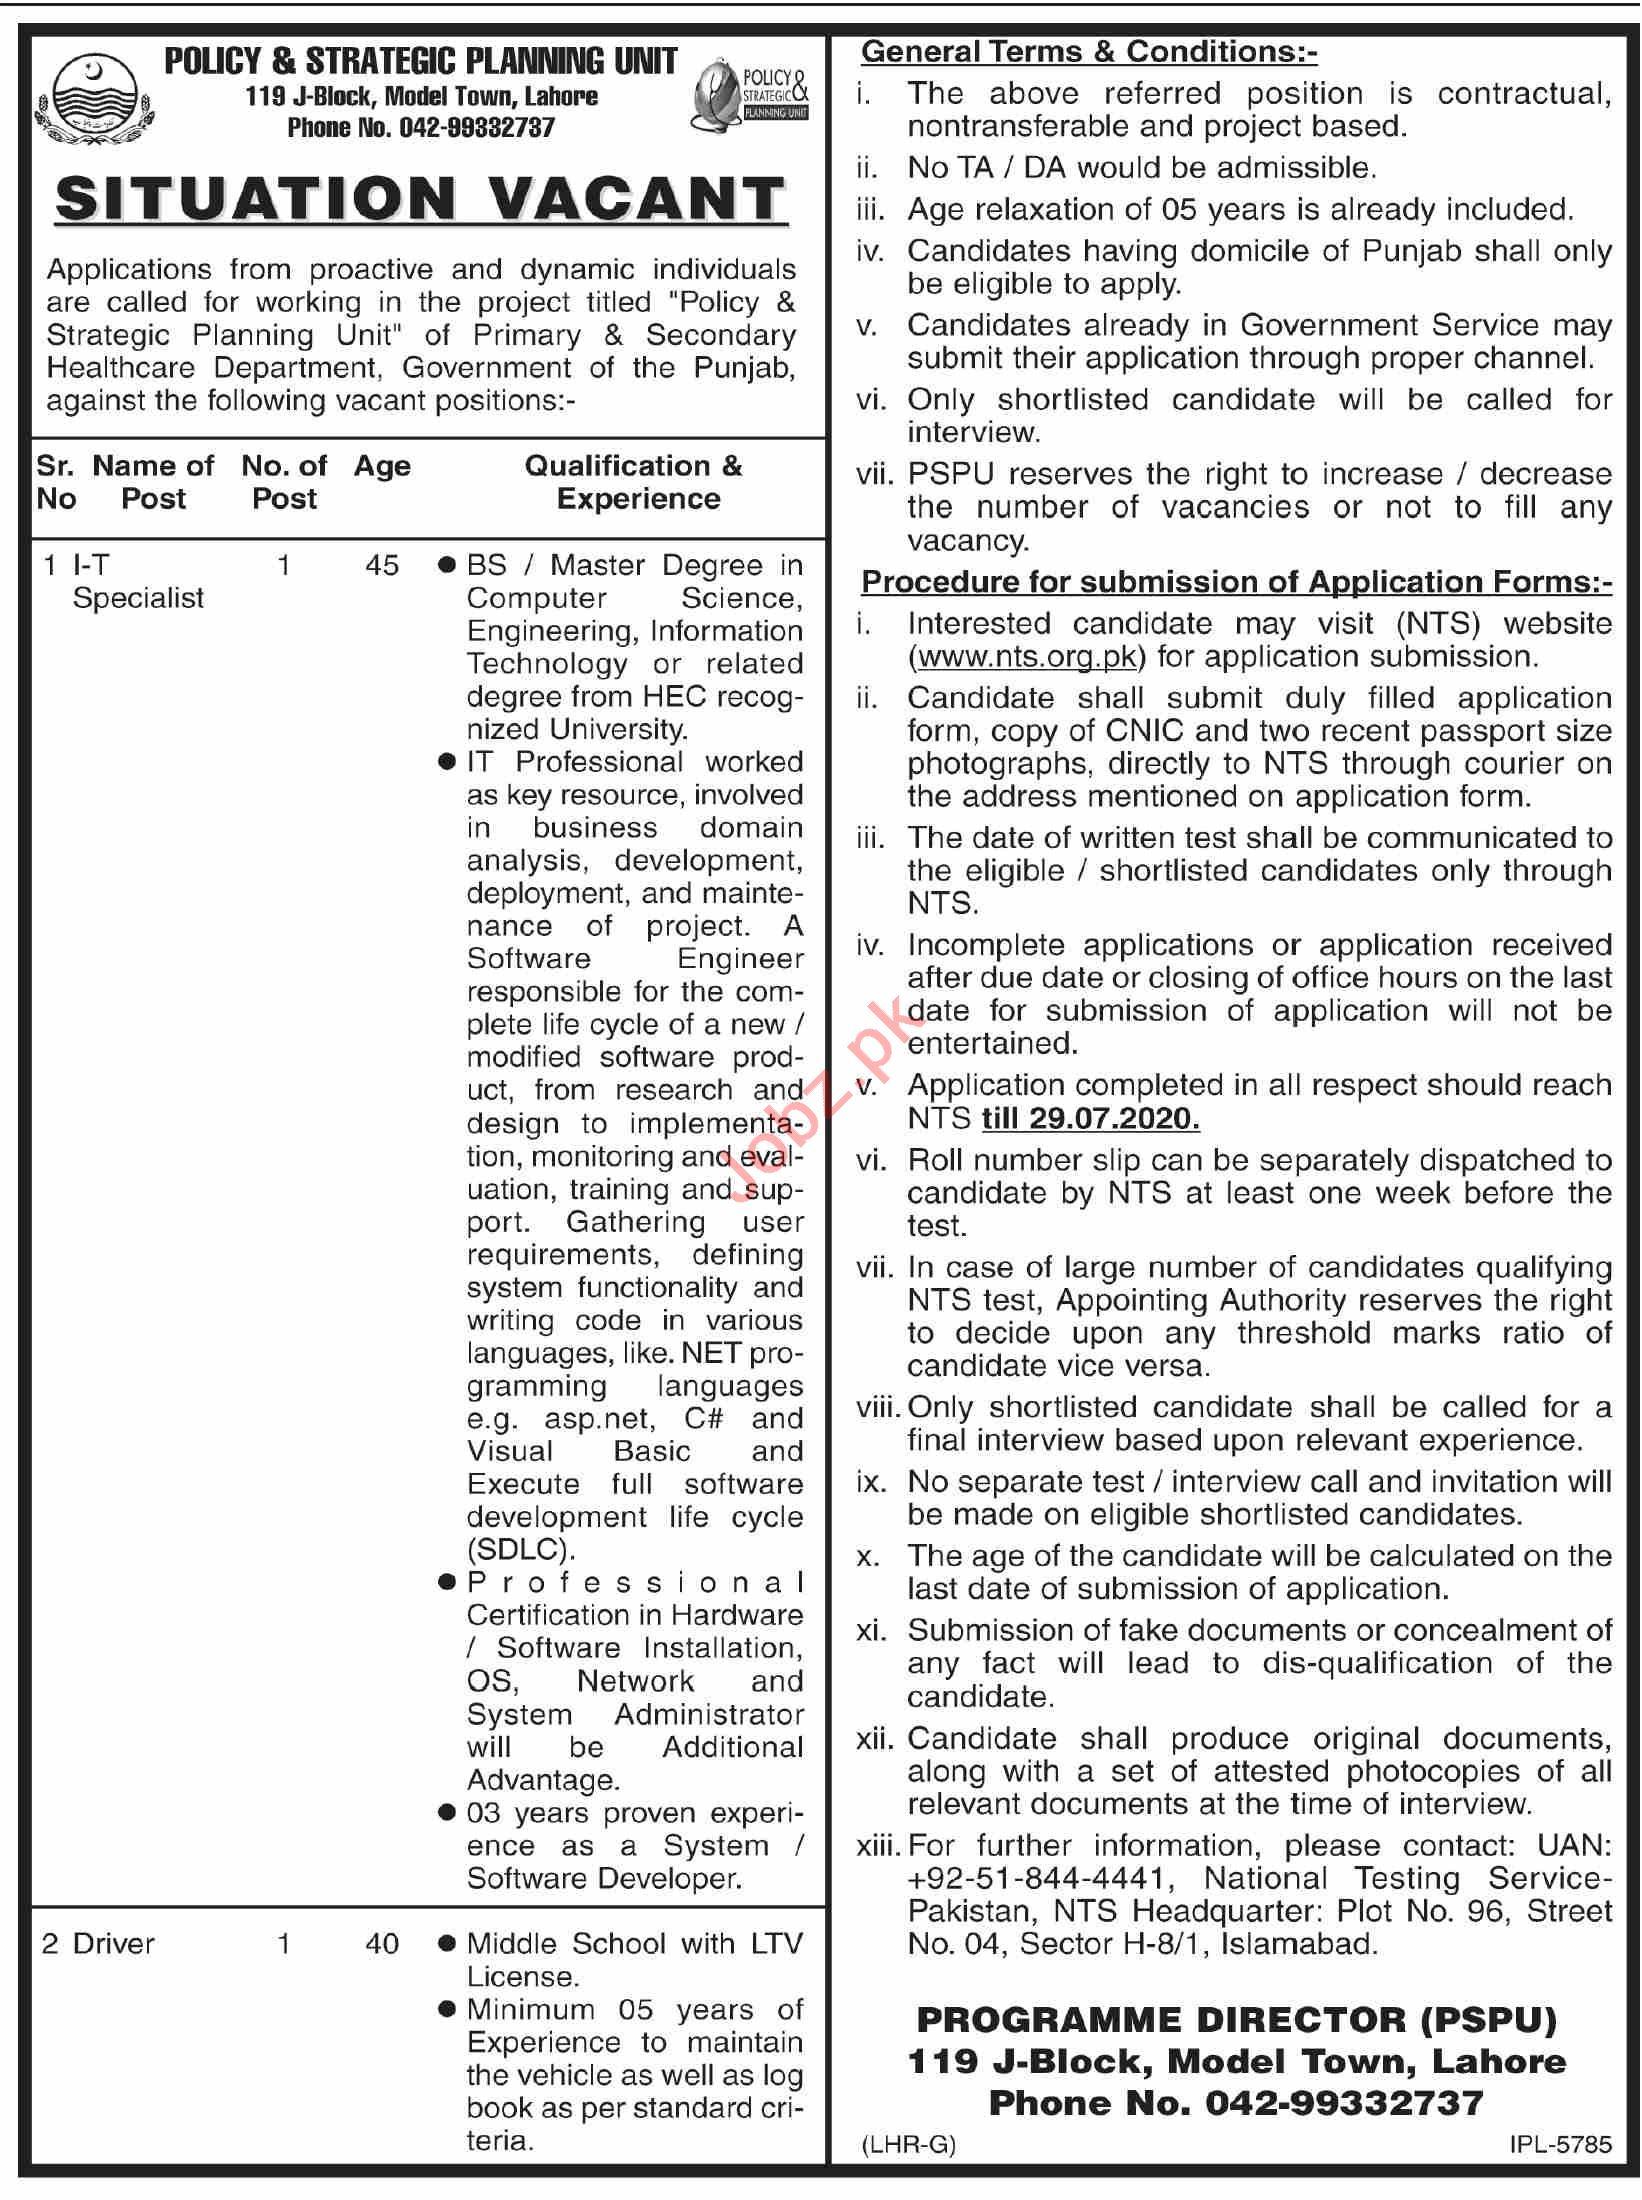 Policy & Strategic Planning Unit PSPU Lahore Jobs 2020